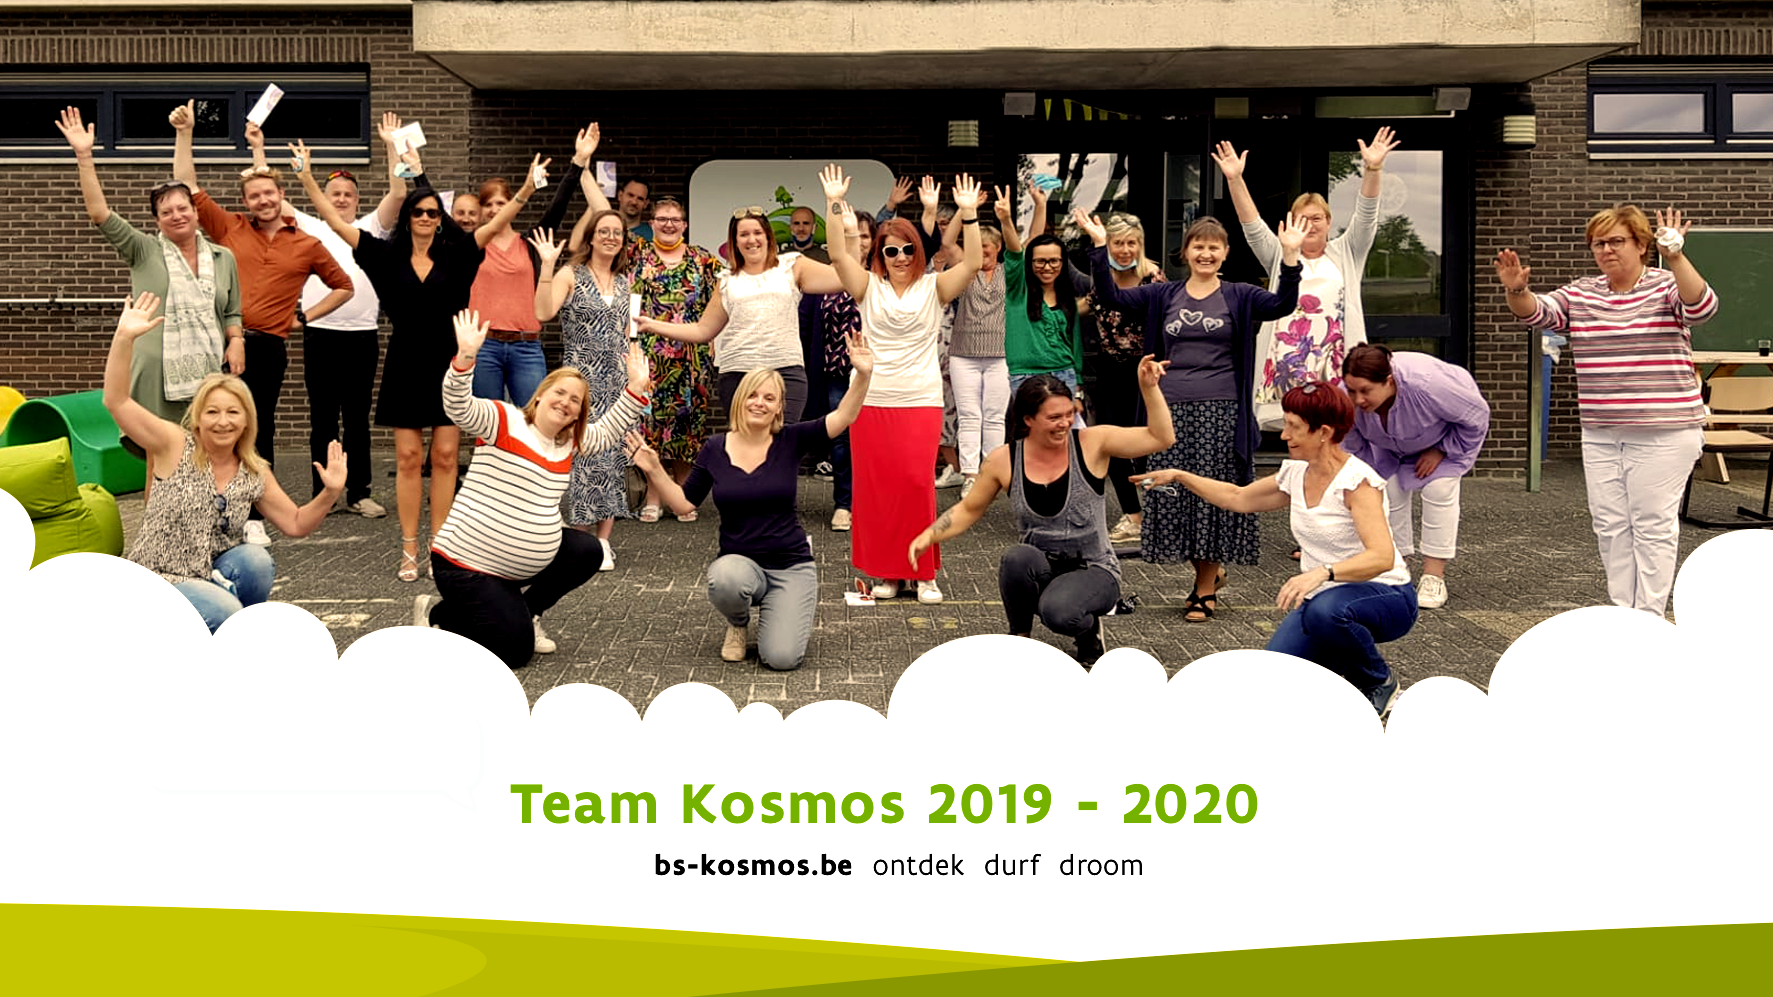 Team Kosmos 1